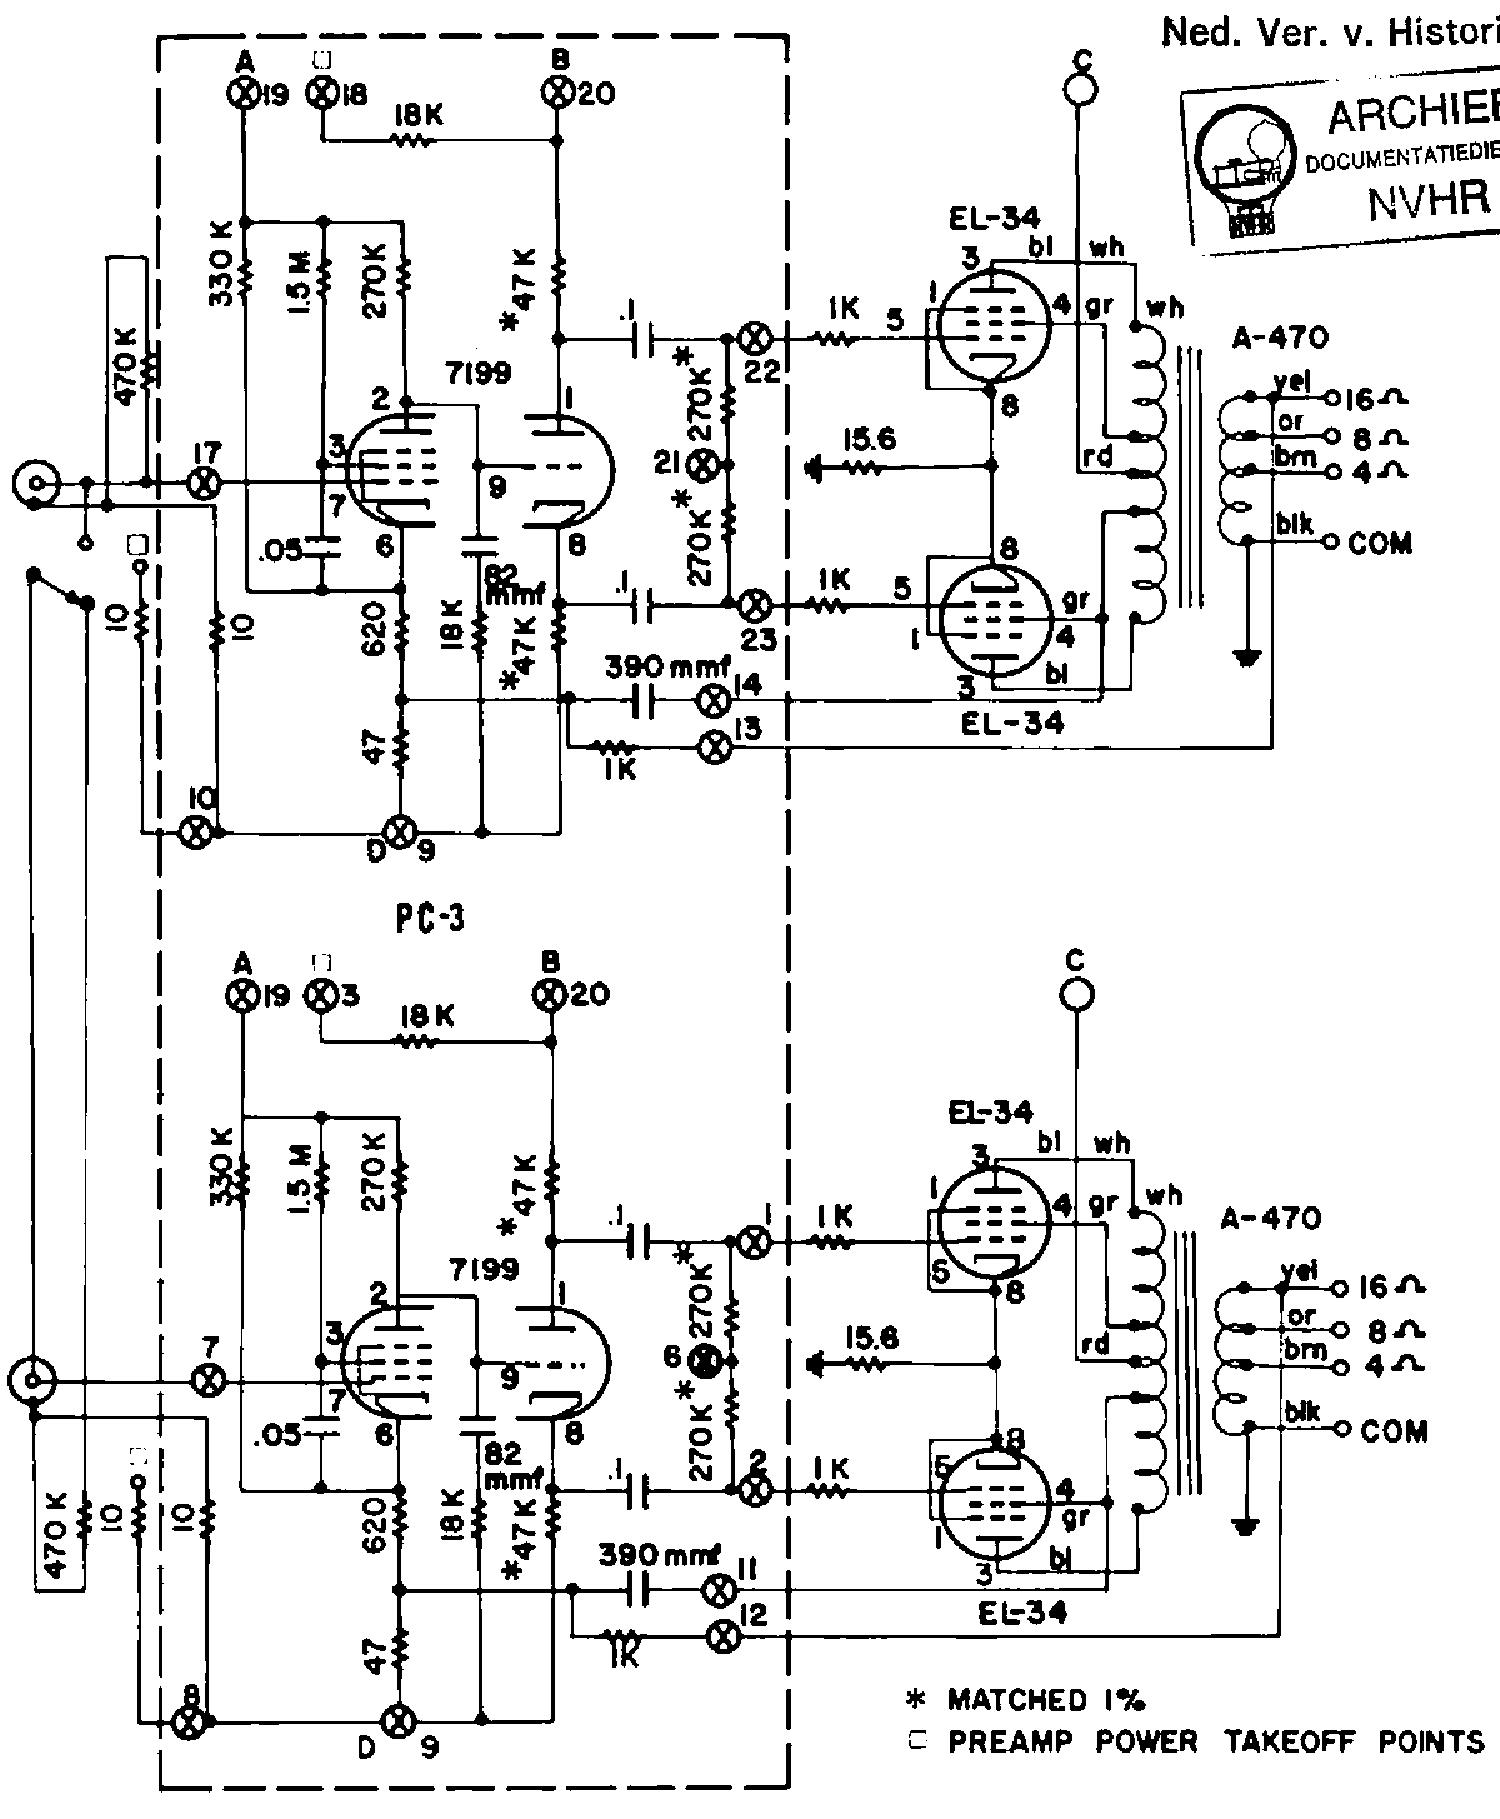 dynaco stereo 70 repair guide curcio audio